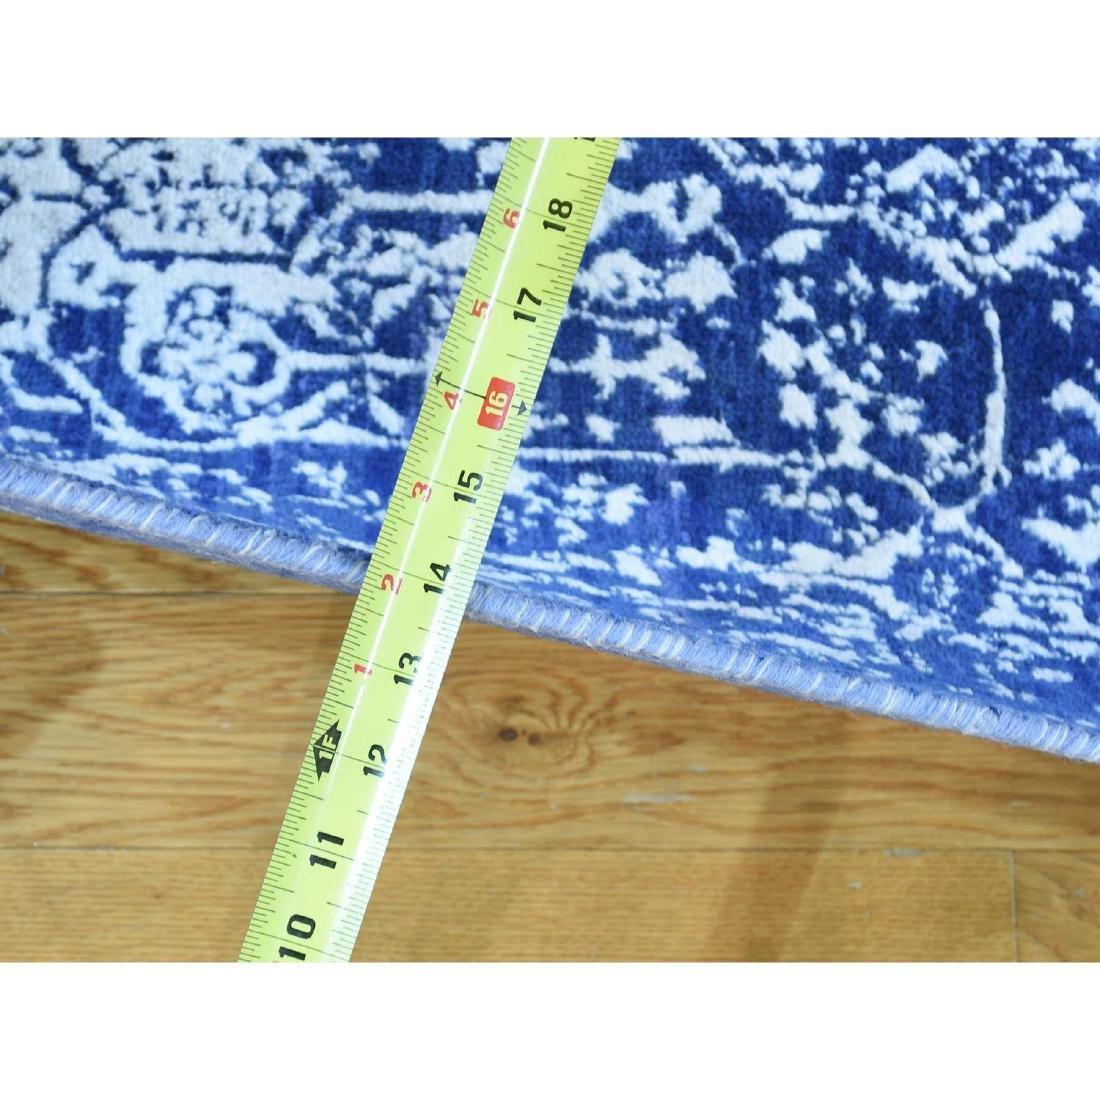 Wool and Silk Hand-Knotted Broken Persian Design Runner - 3